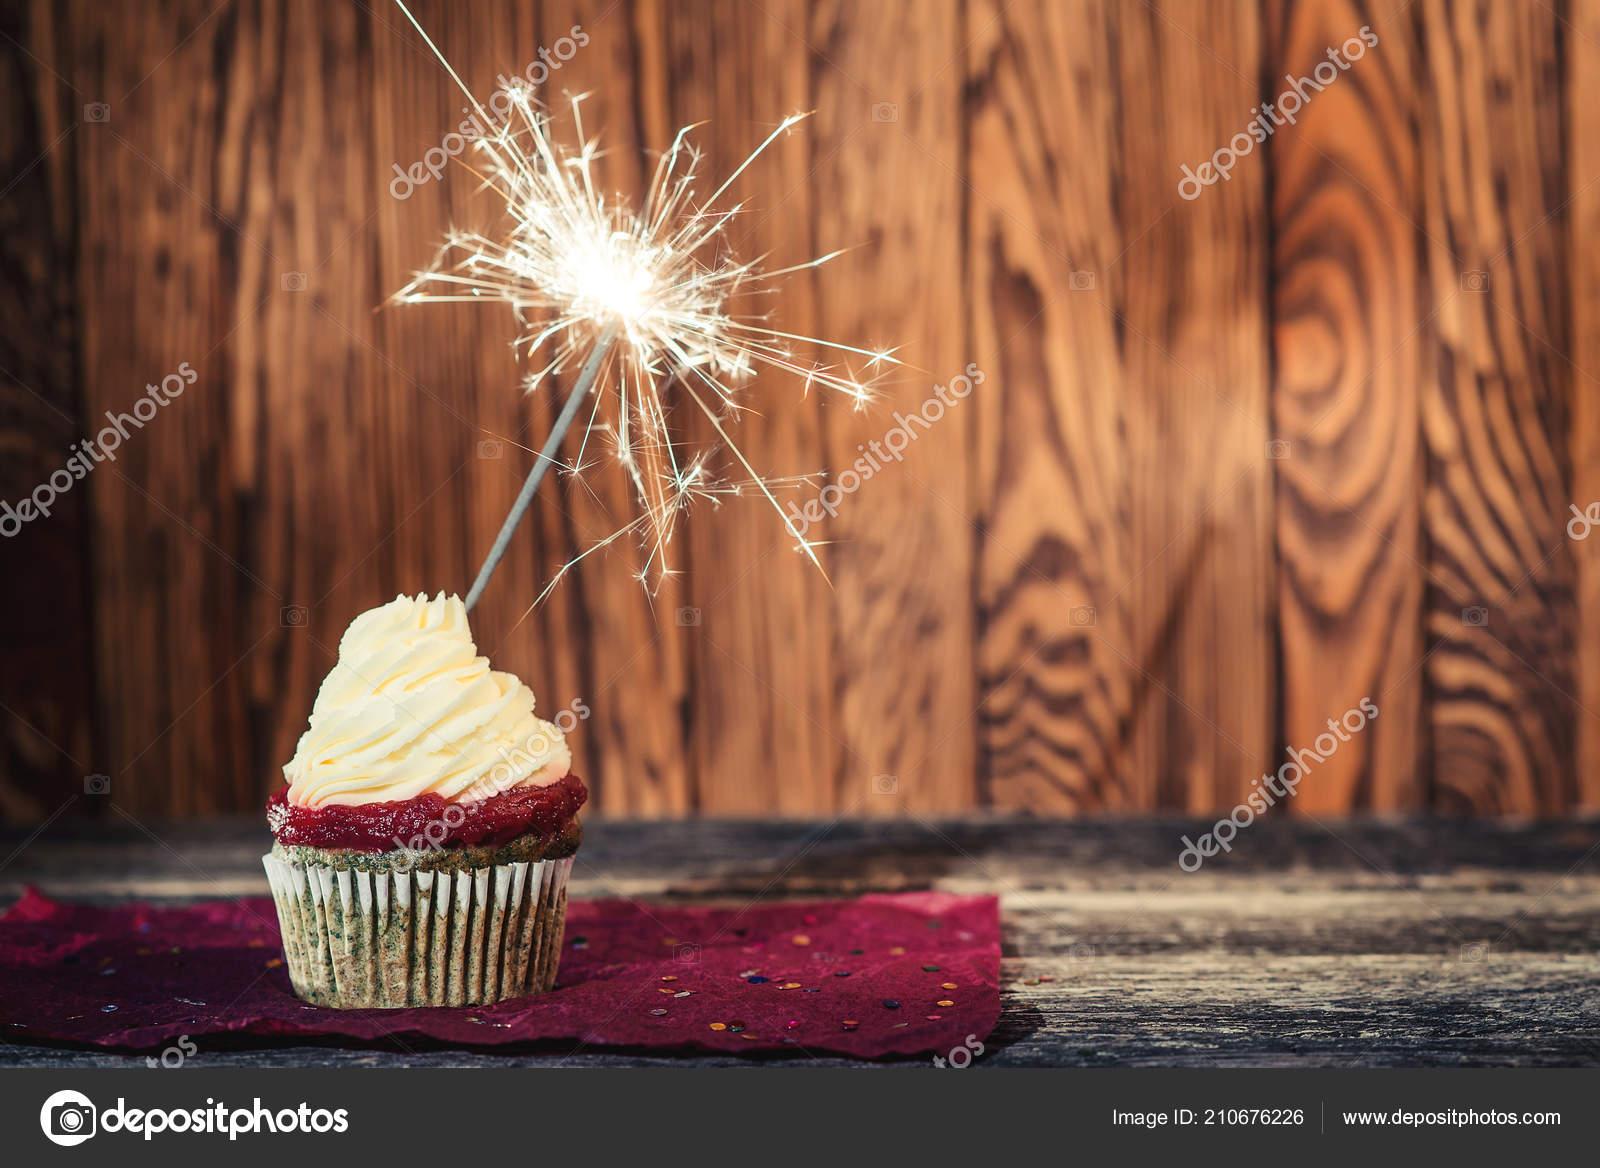 Groovy Happy Birthday Tiki Cake Cupcake Cream Cheese Birthday Cake Funny Birthday Cards Online Inifodamsfinfo